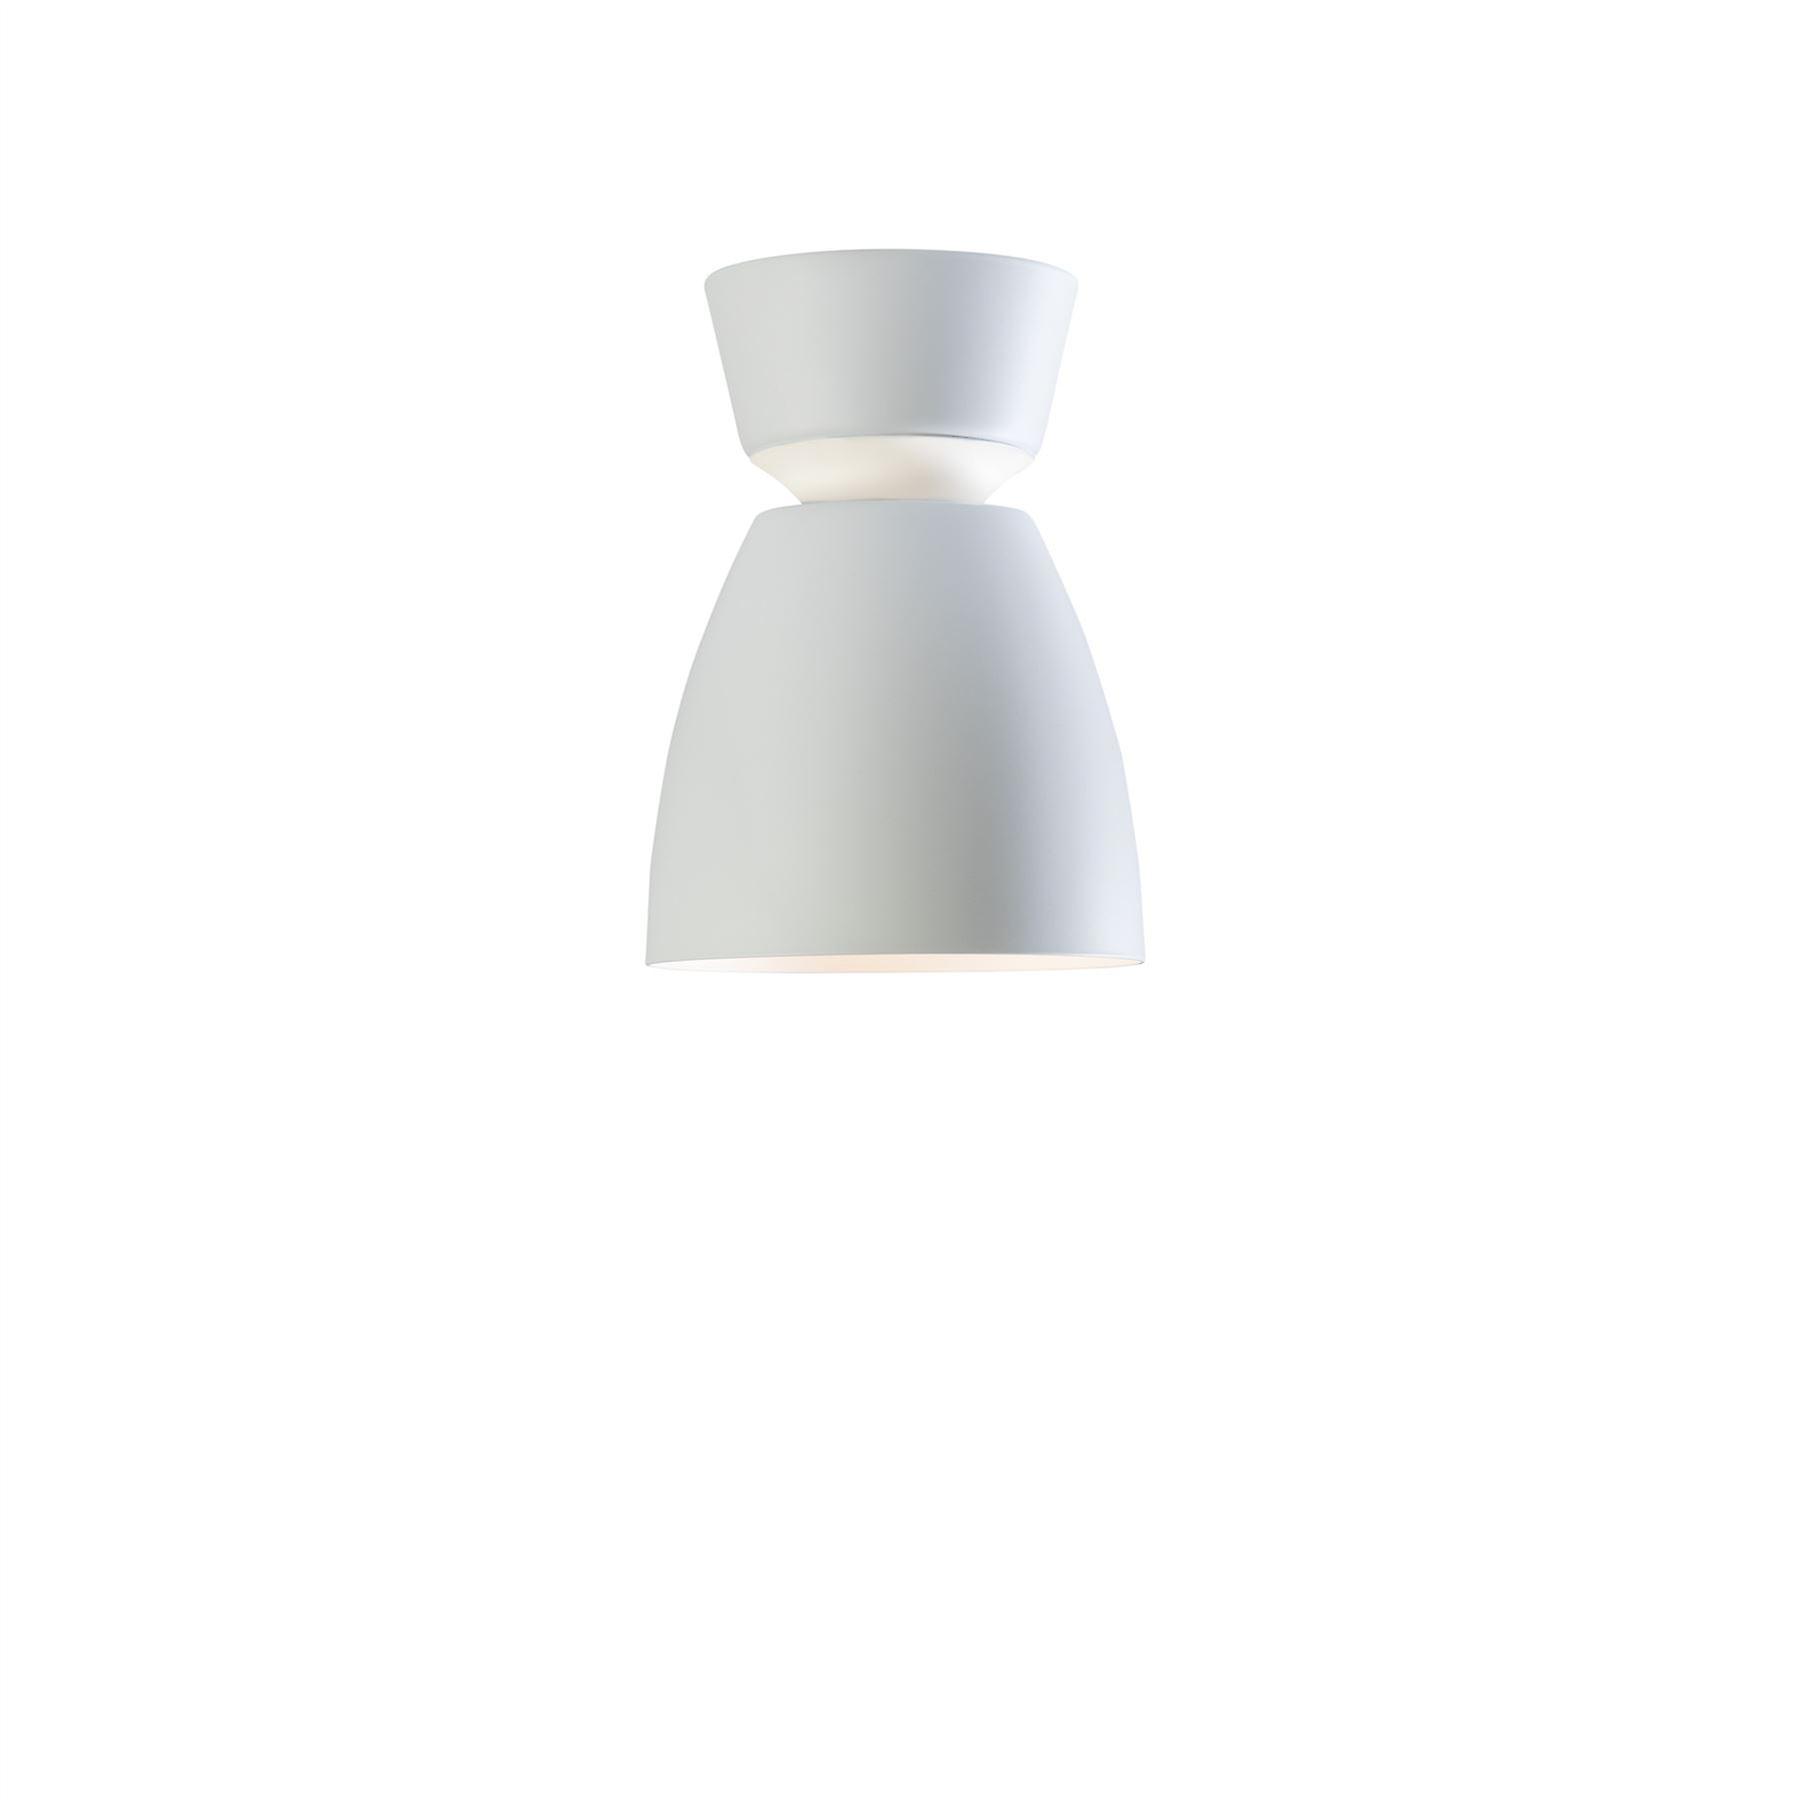 Belid - Anemon Ceiling Light Matt blanc Finish 202136